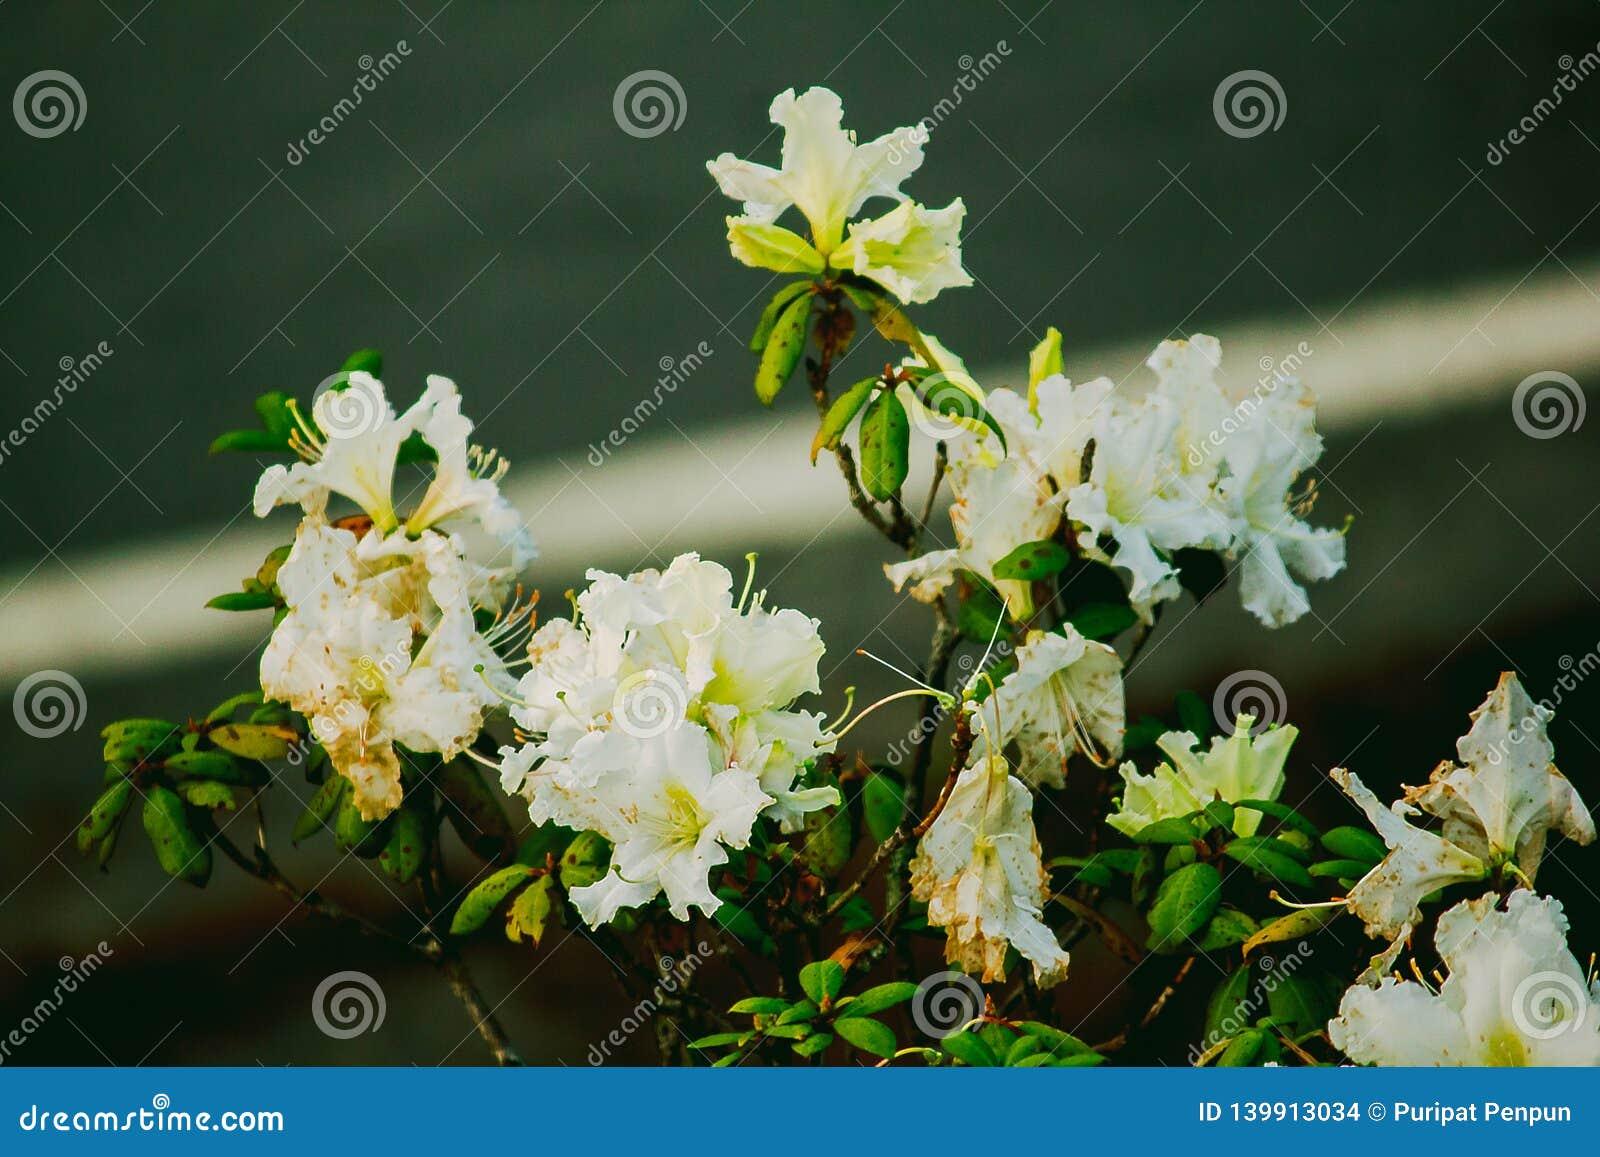 A azálea é o nome de família da planta de florescência no gênero moulmainense do rododendro